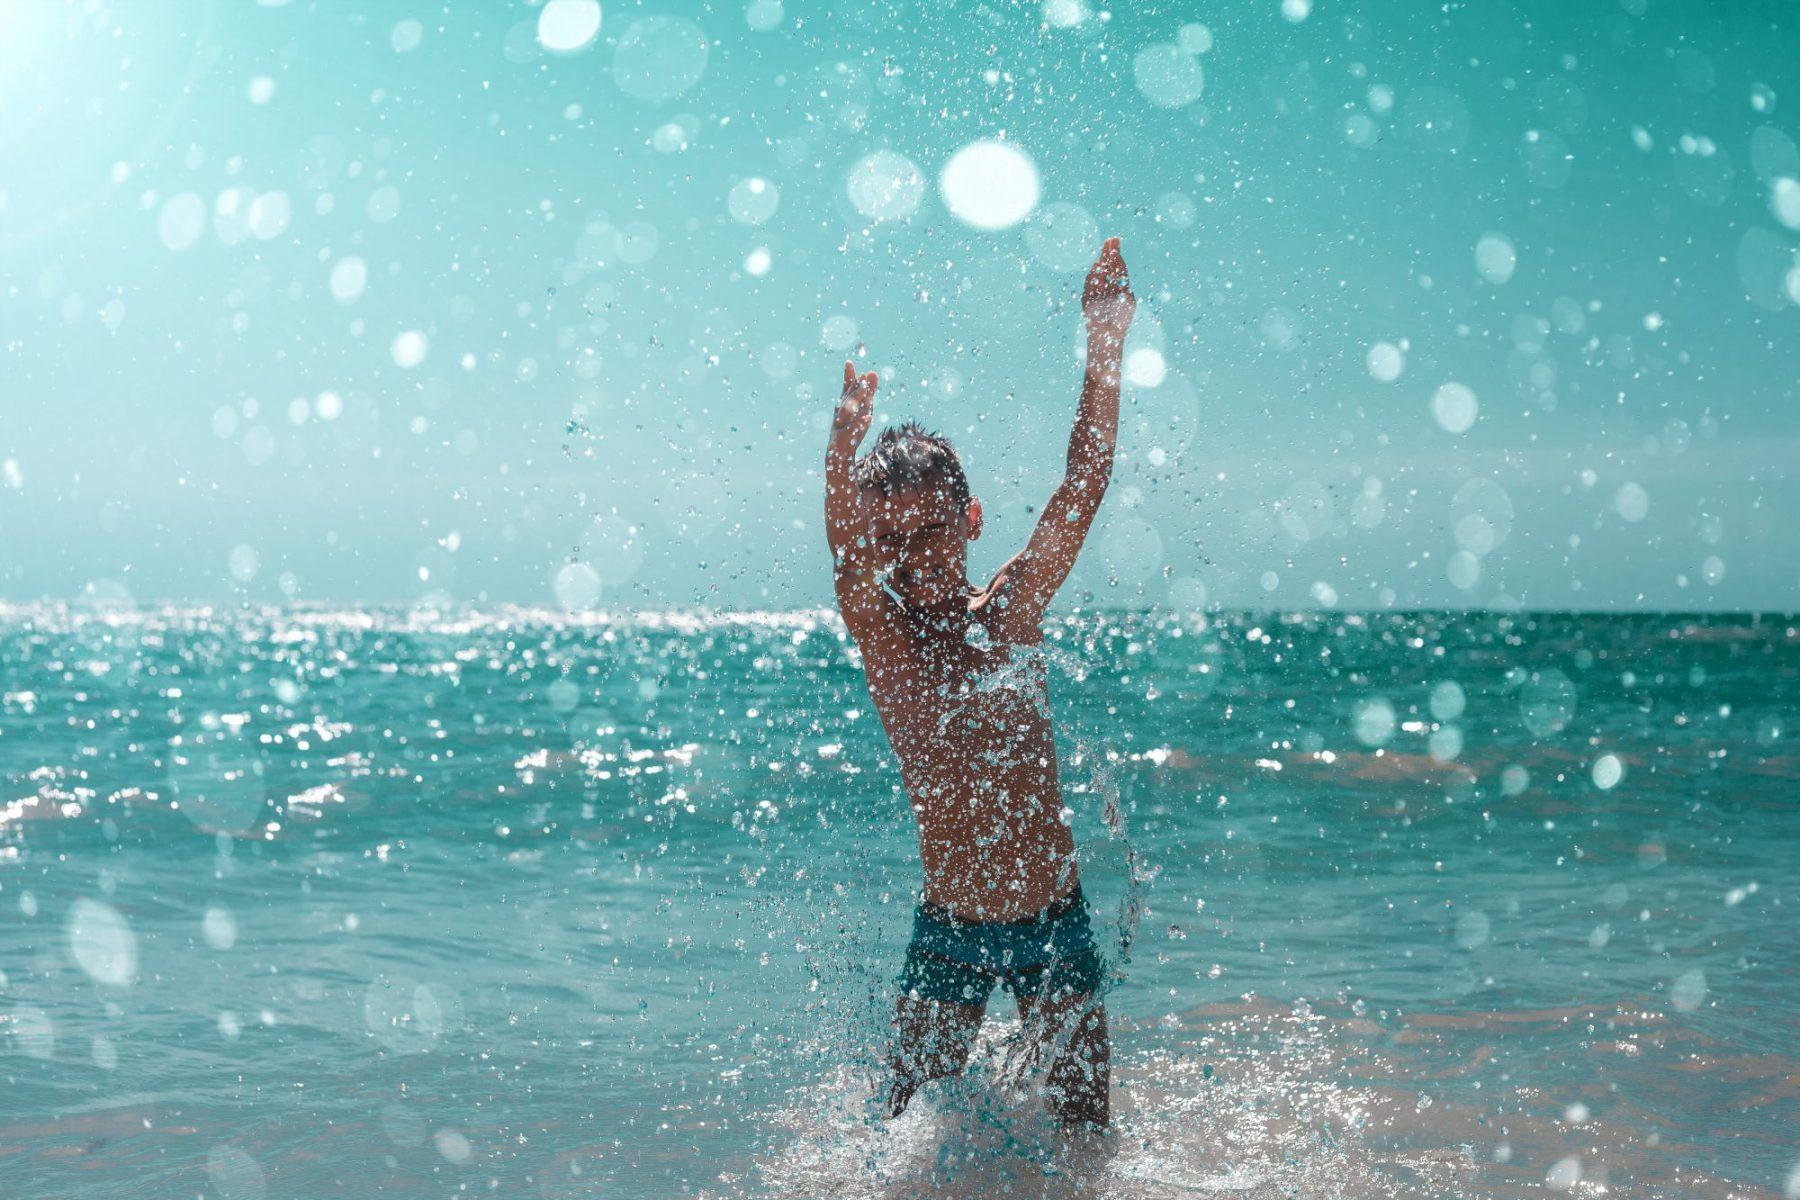 A Summer of Fun for the Kiawah Island Kid